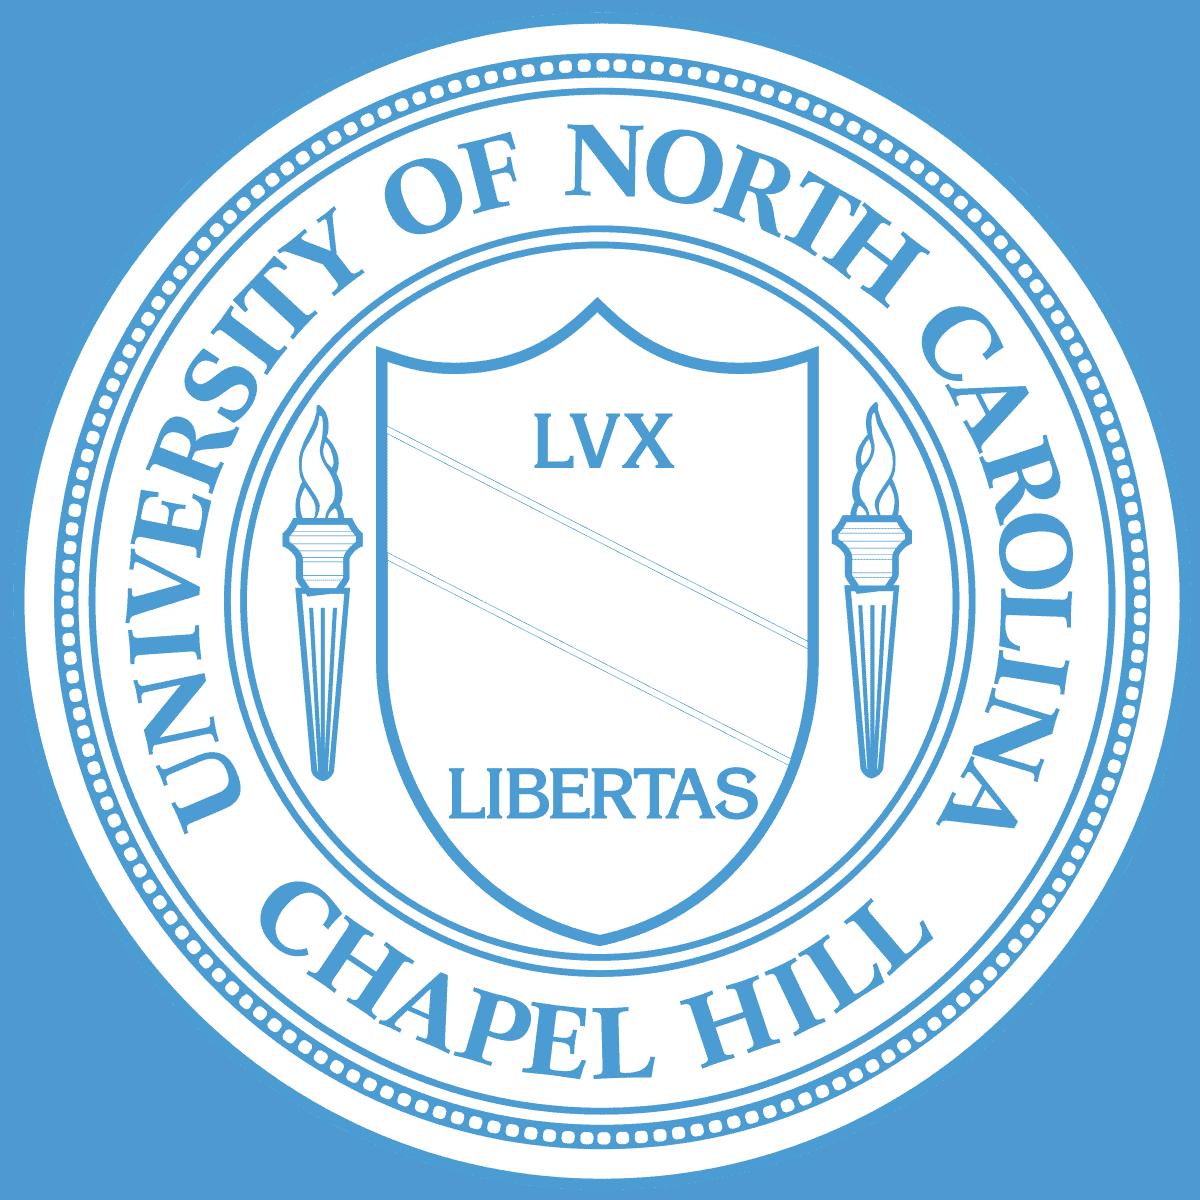 University of North Carolina Coin Customer